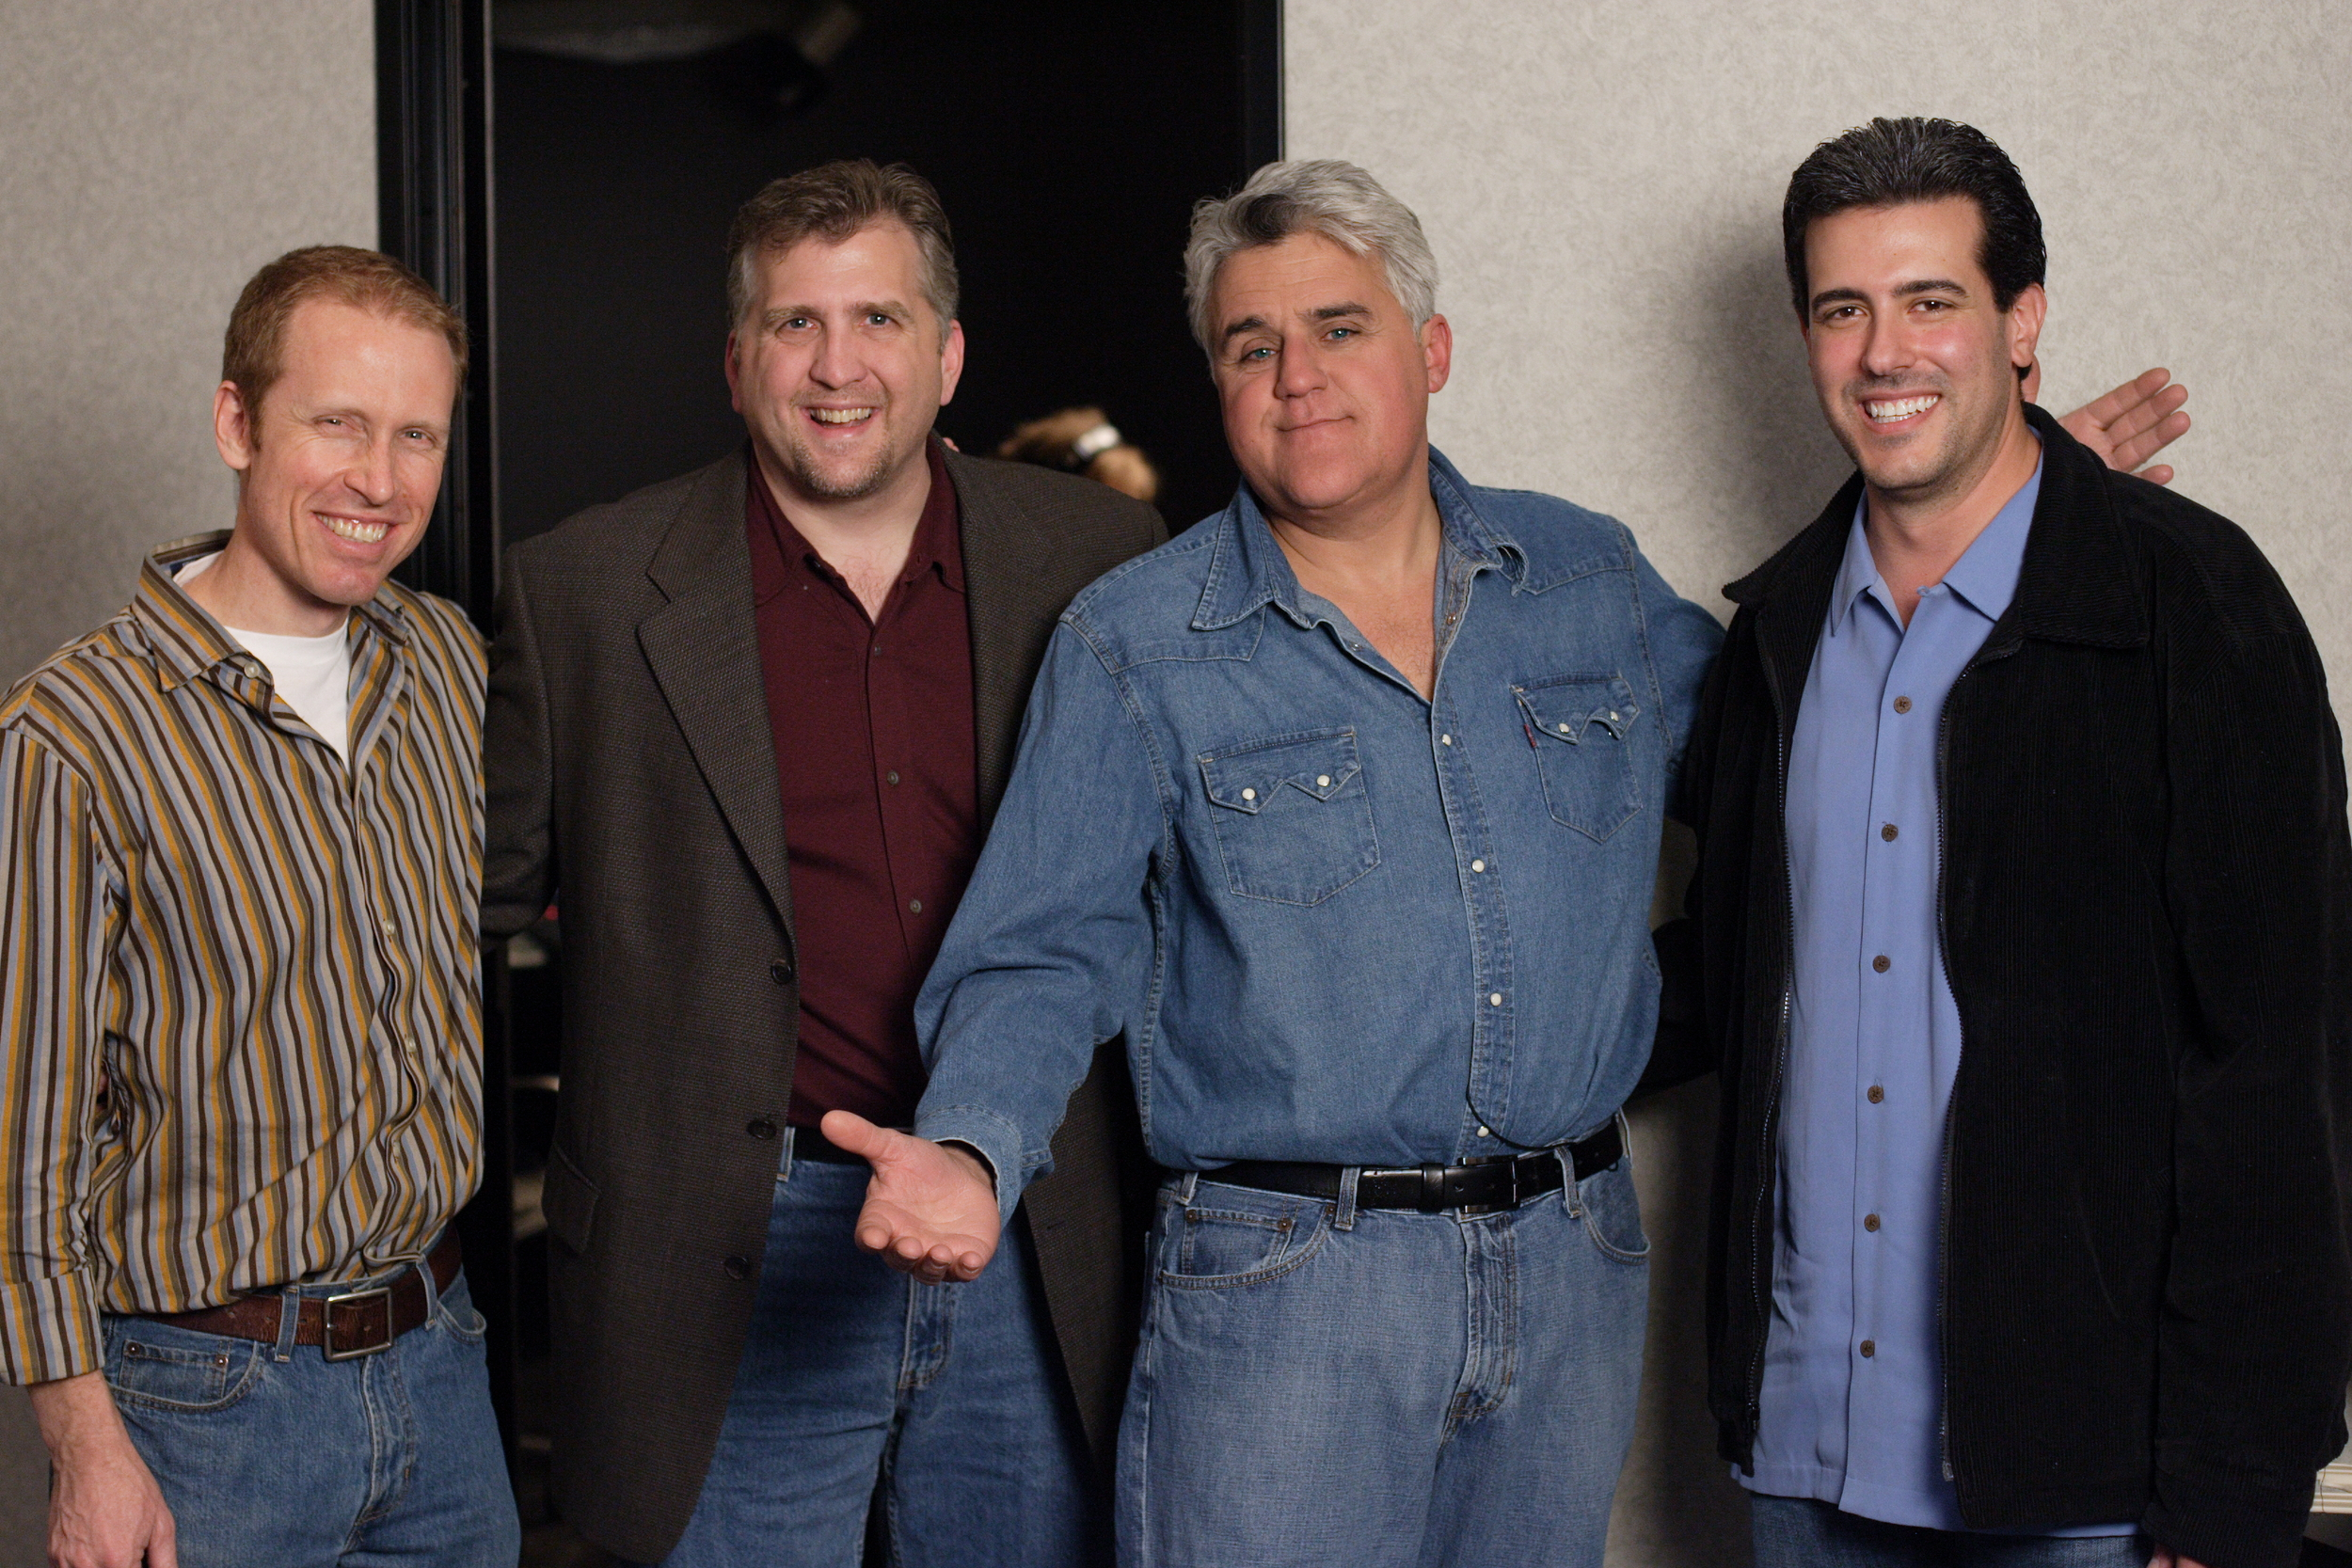 Jim Praytor (Producer), Daniel Roebuck (Paul Rocco), Jay Leno (Narrator) and Robert Zappia (Writer, Director, Producer)